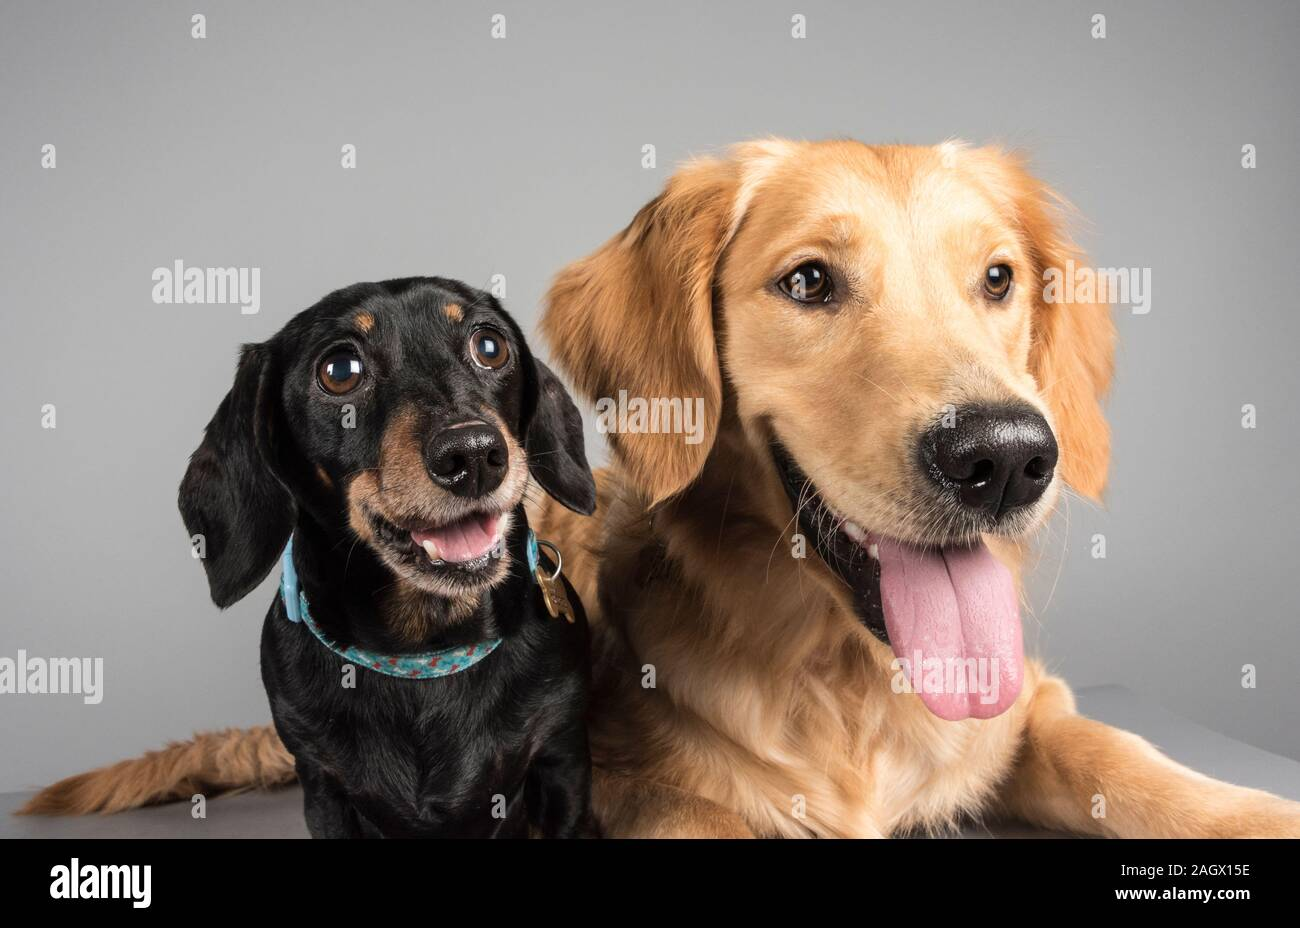 Miniature Dachshund (9yrs) & a Golden Retriever puppy 10months Stock Photo